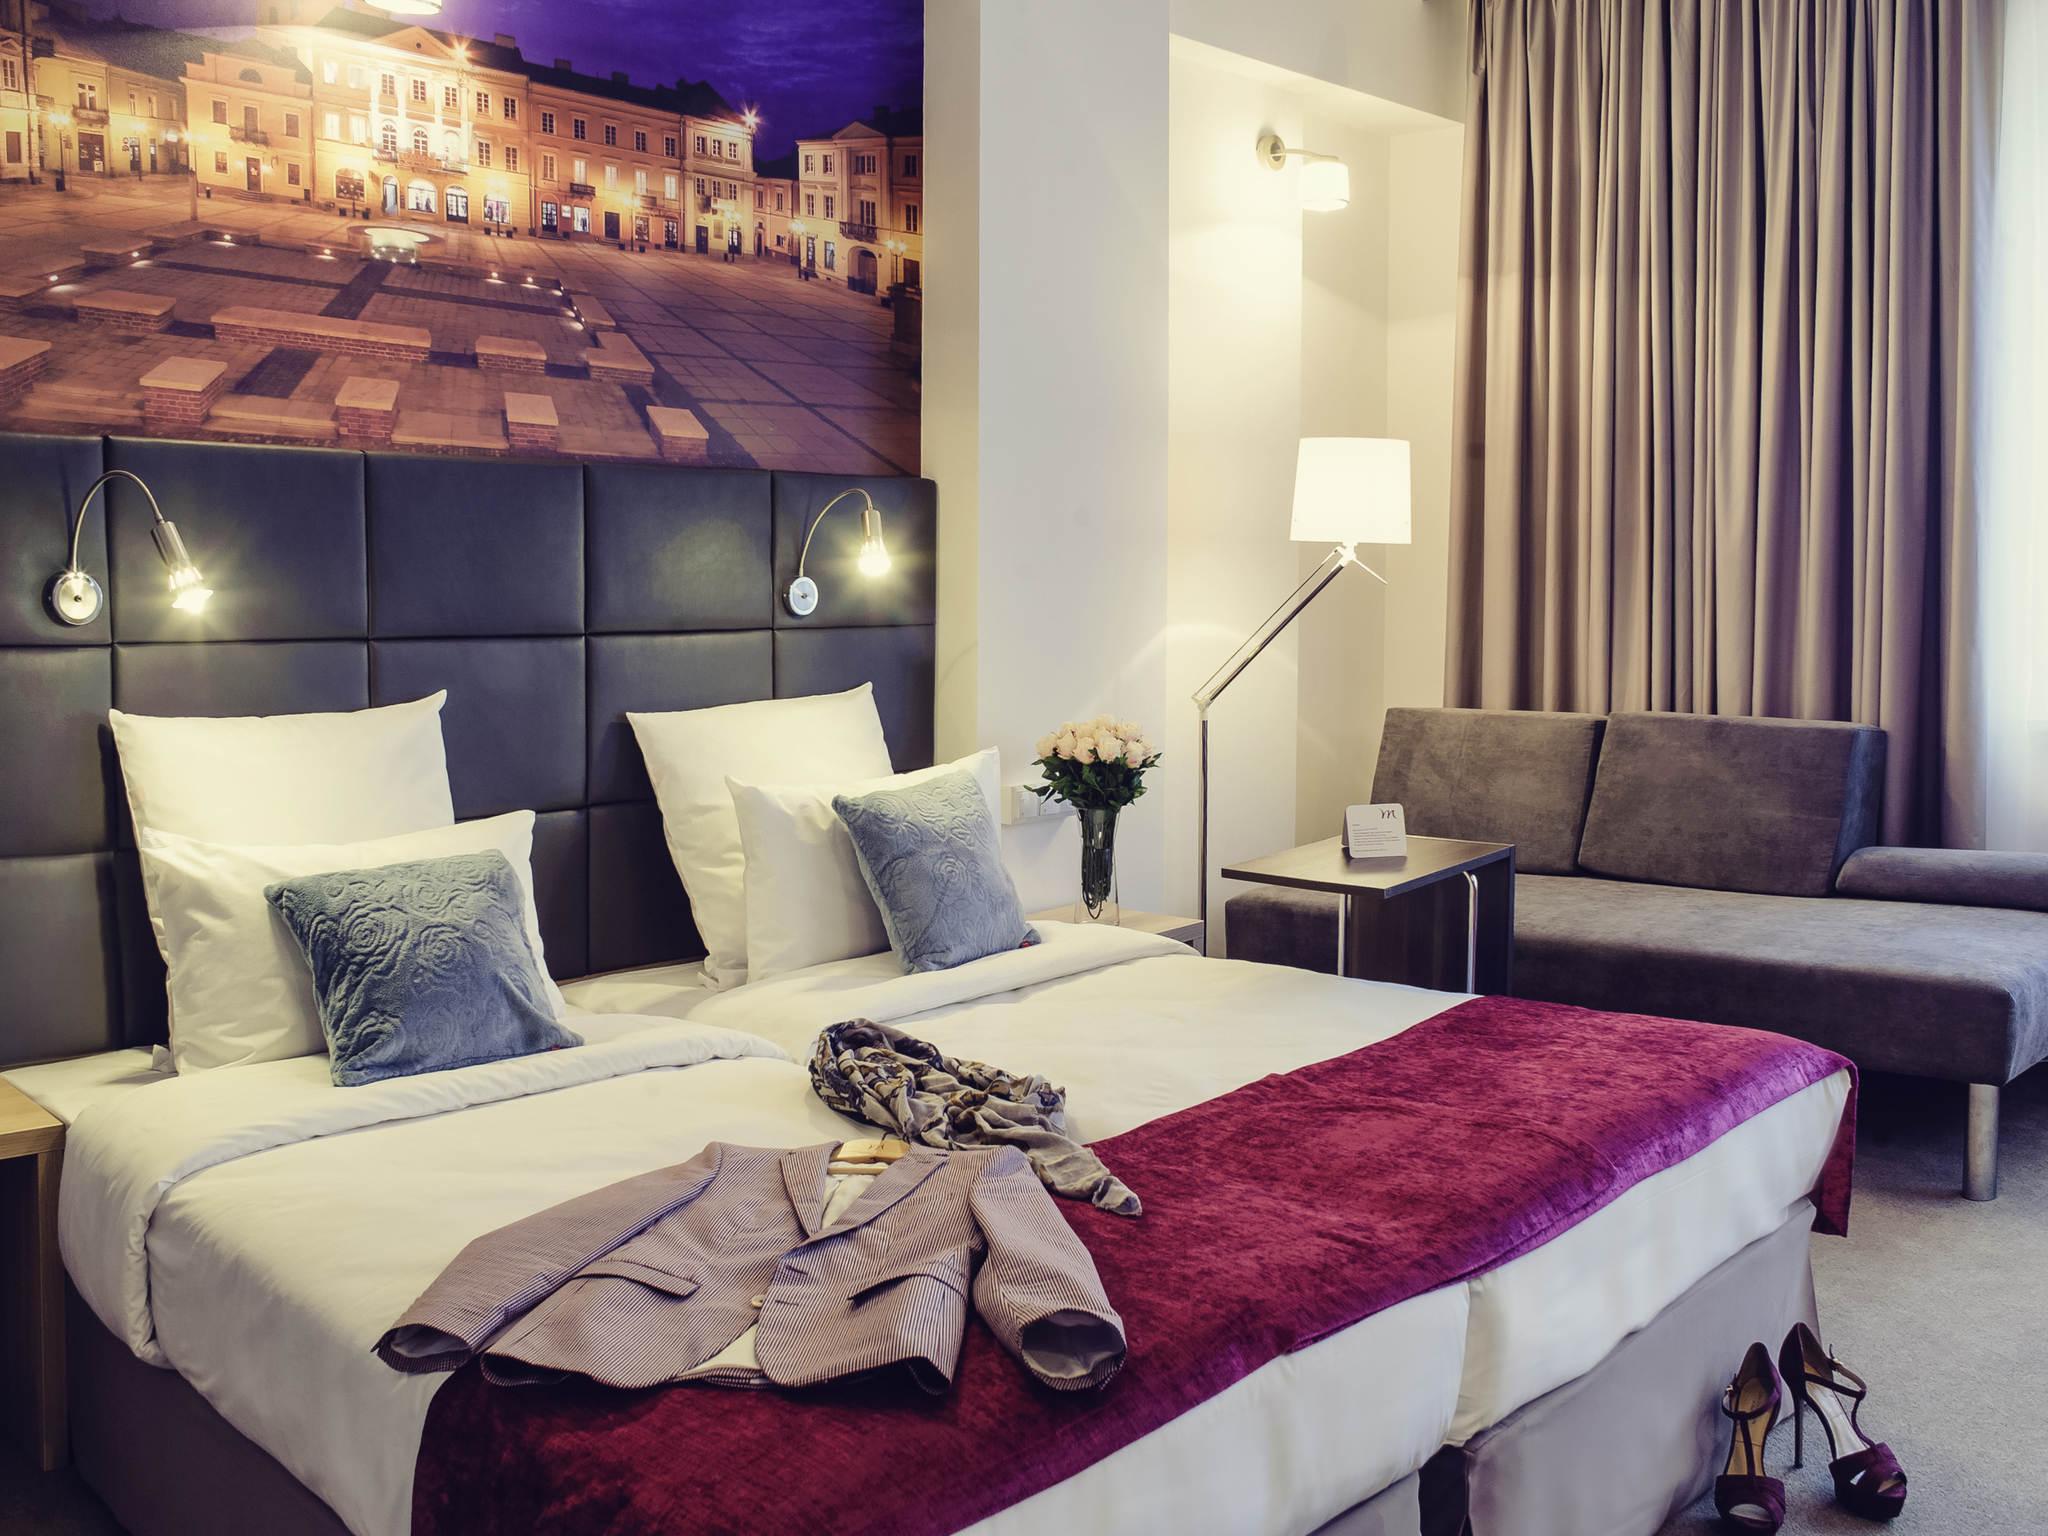 Hotel – Hotel Mercure Piotrków Trybunalski Vestil